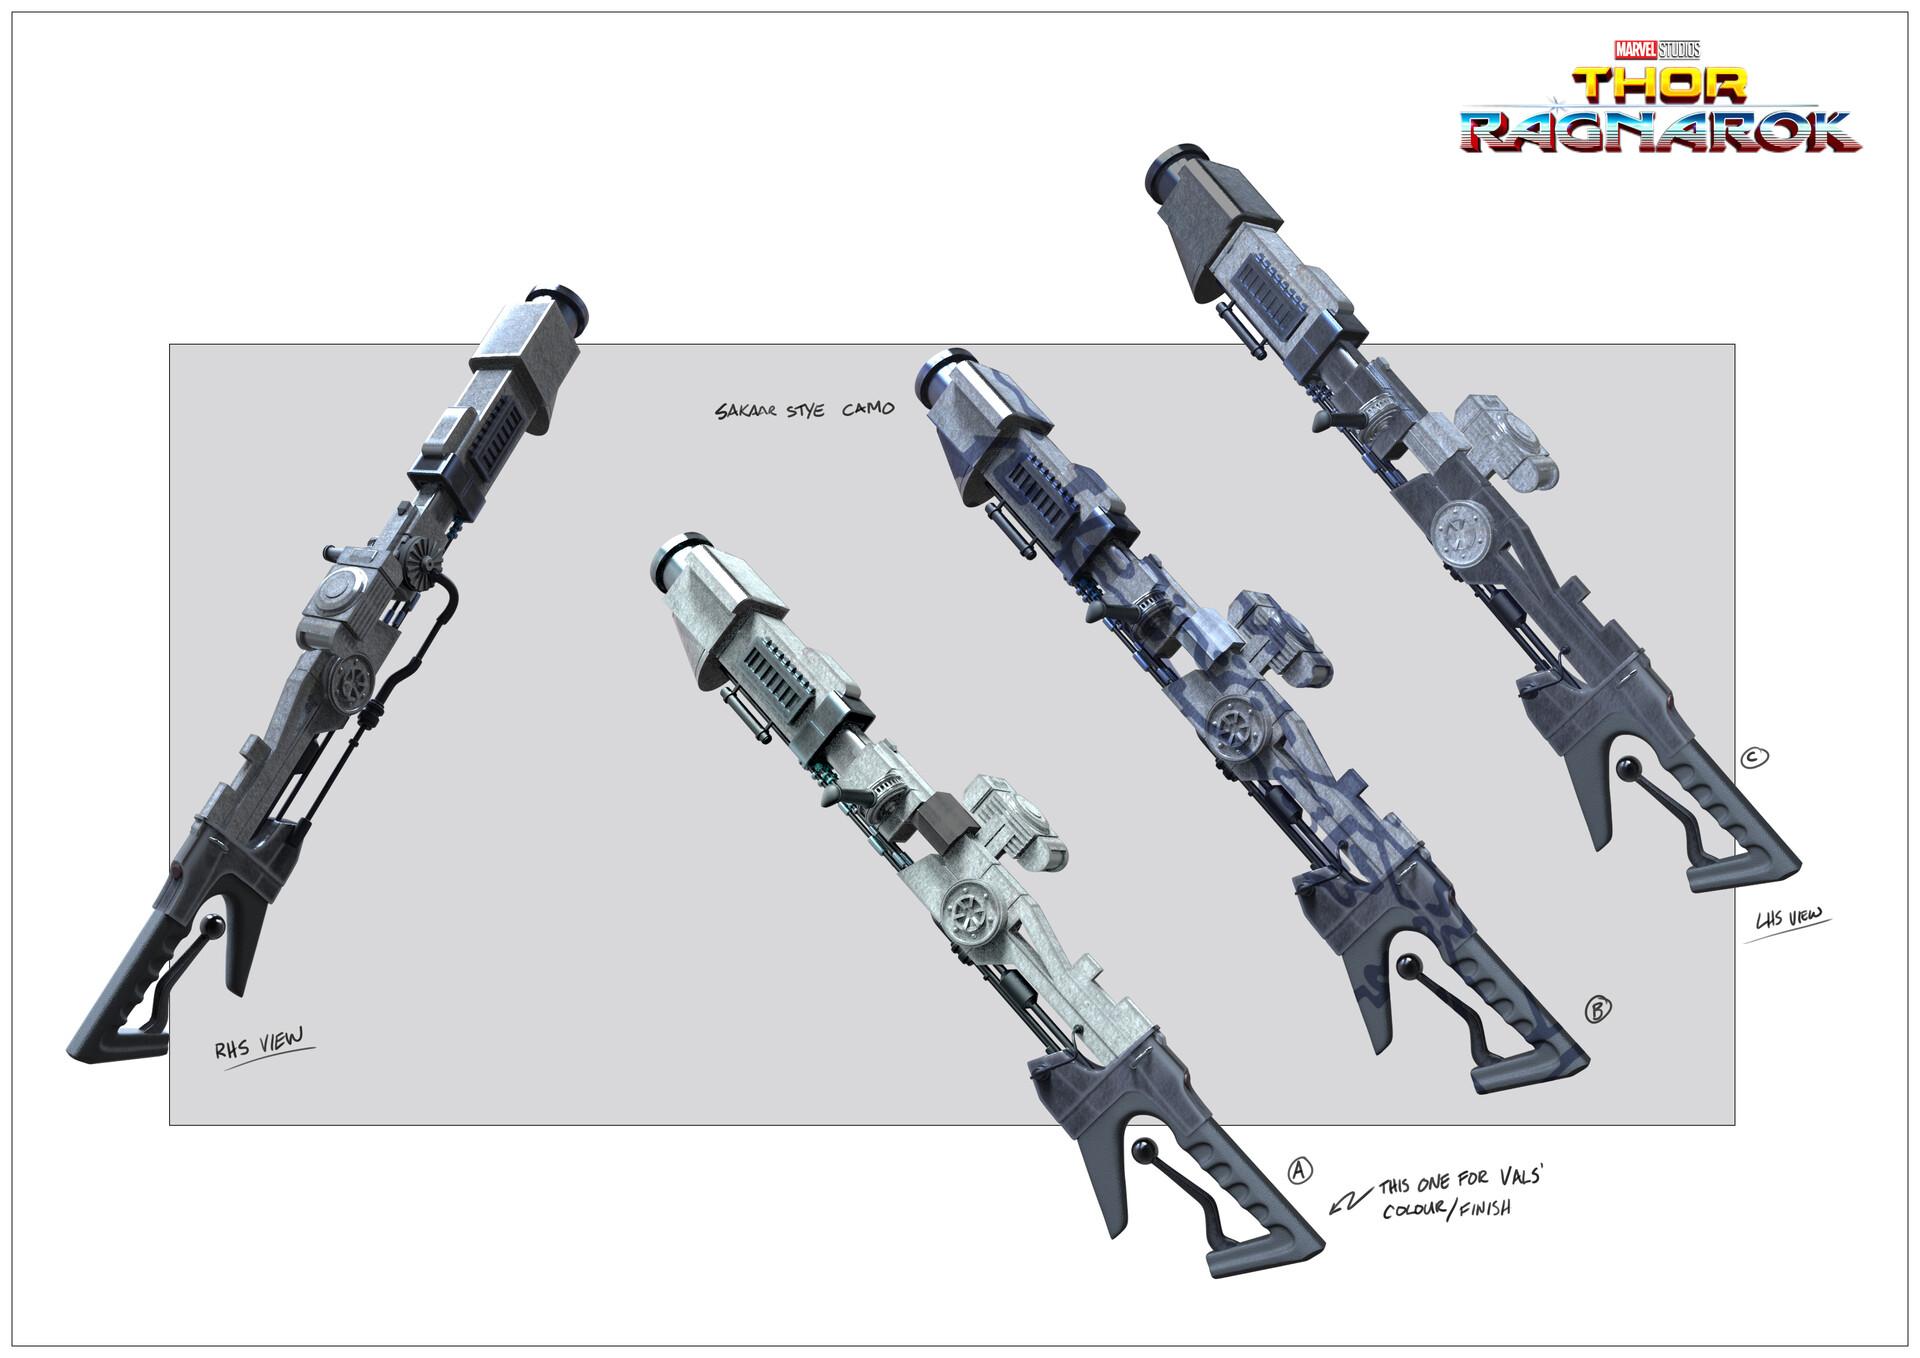 Sakaarian rifle - based off of Jack Kirby space station illustration.